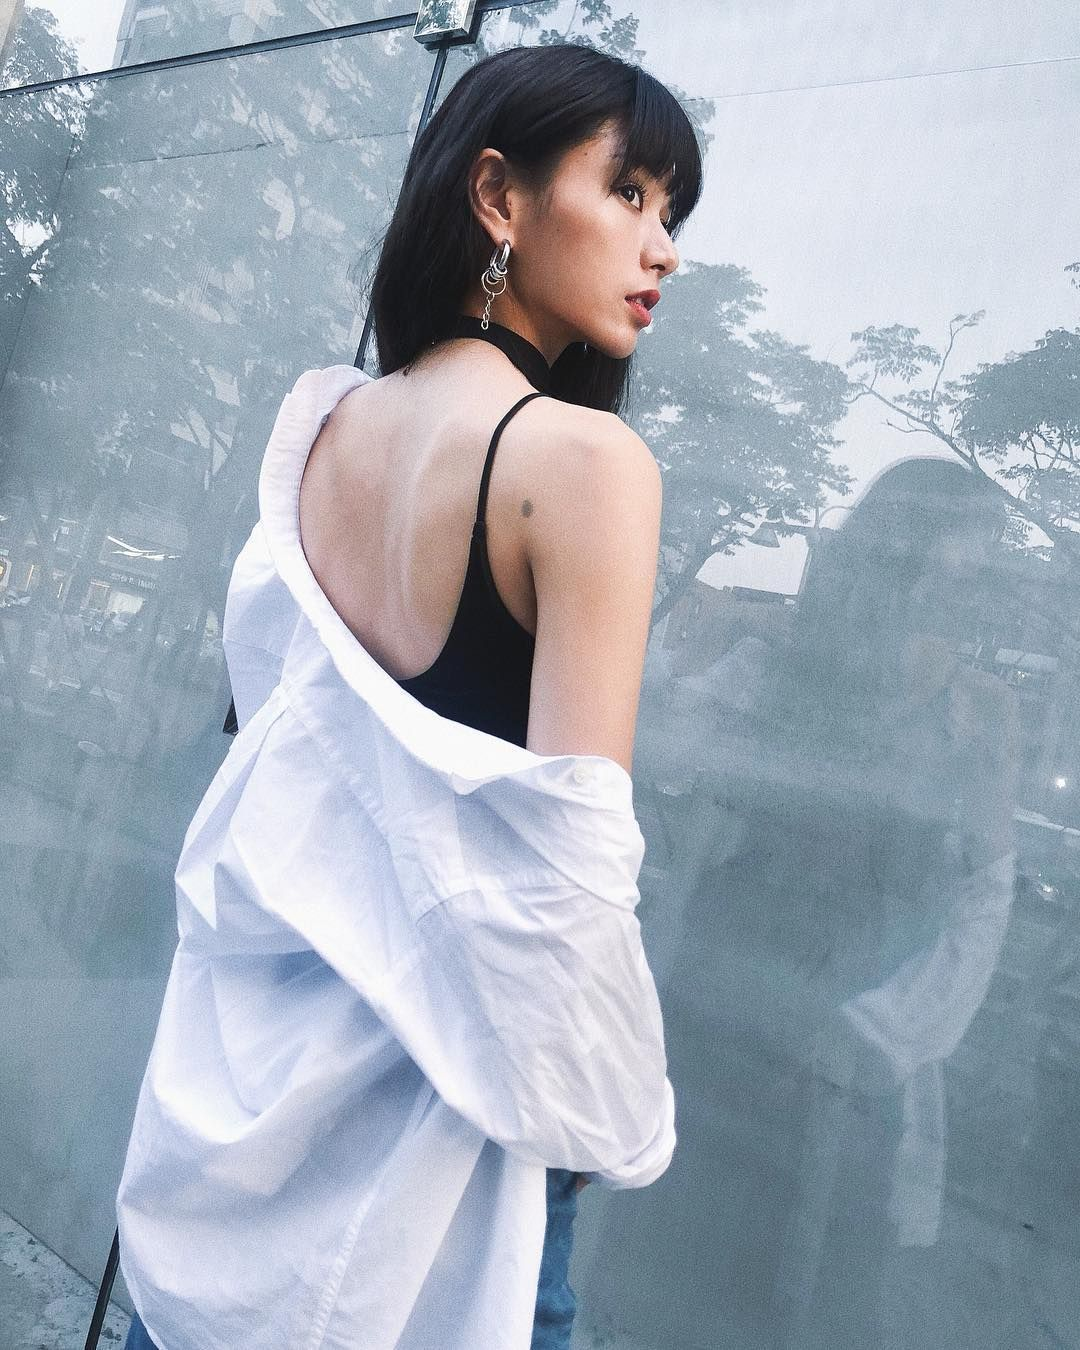 AIRism, Alexander Wang, UNIQLO, UNIQLOxAlexander Wang, 涼感衣, 台灣, 王大仁